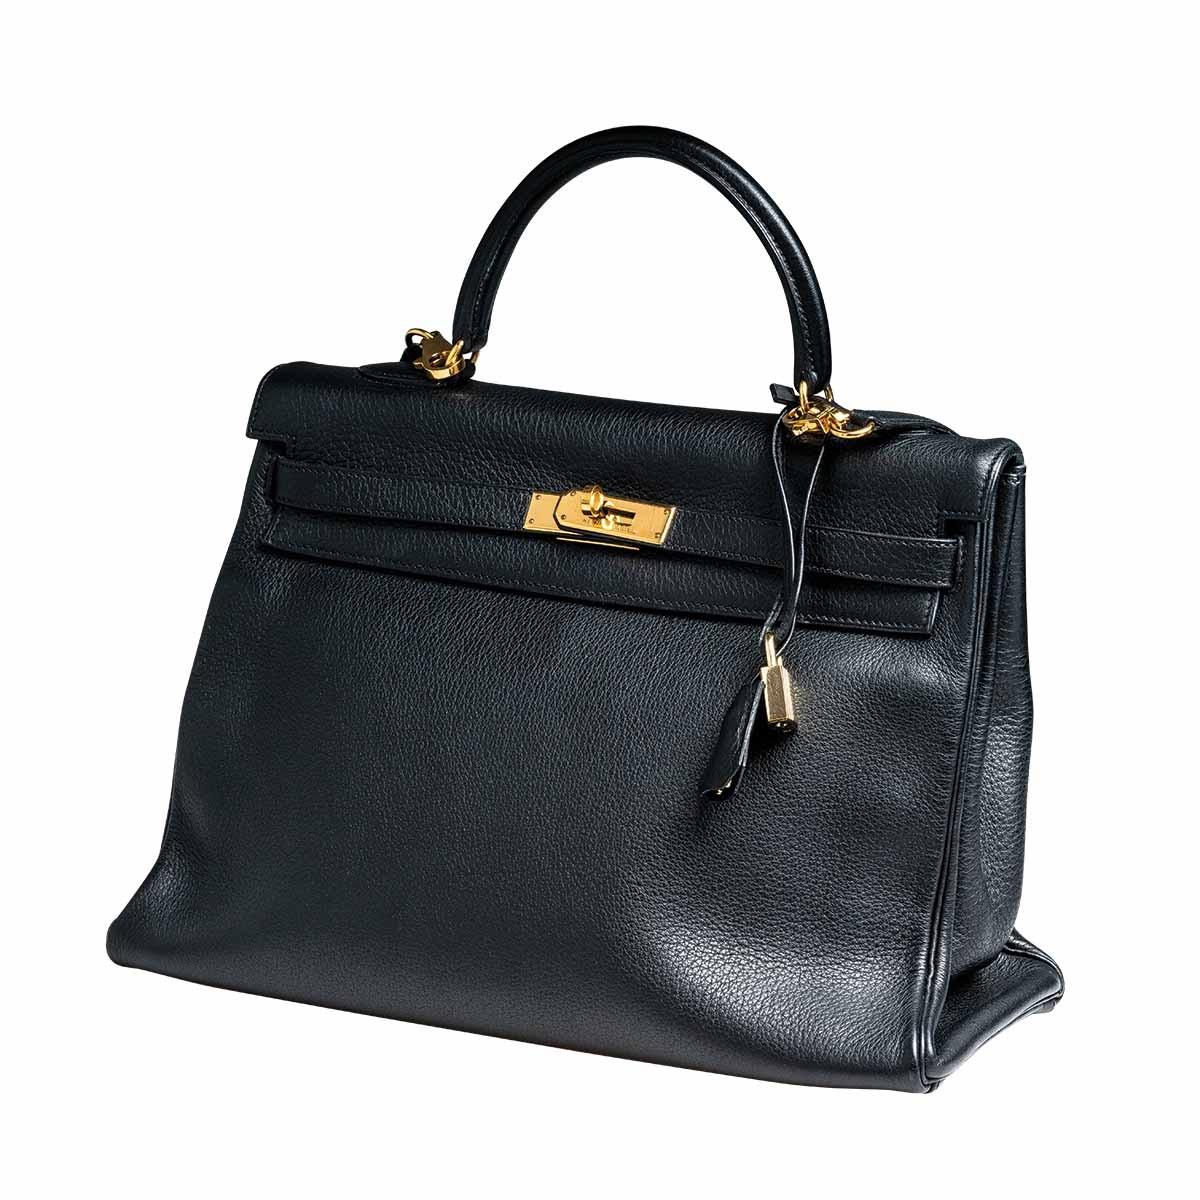 Vintage Hermès Kelly Retourne Handbag